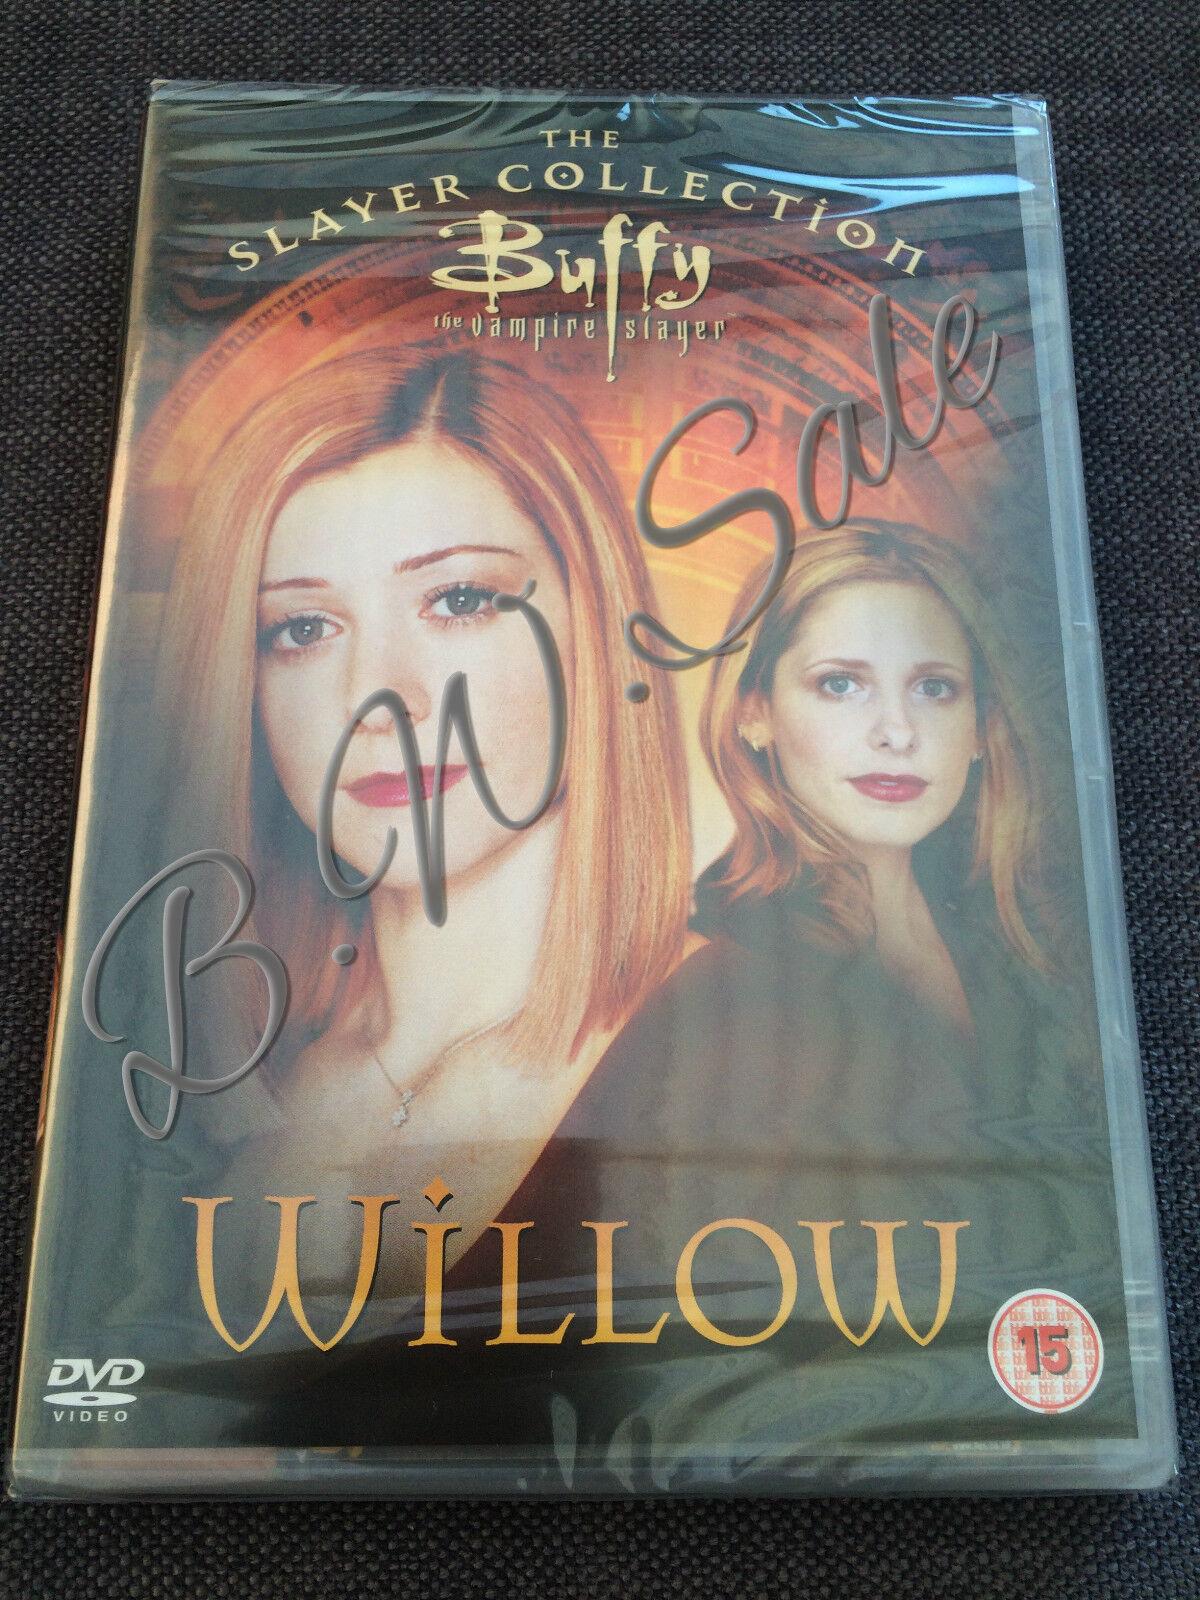 Alyson Ray Video willow buffy vampire slayer alyson hannigan dvd new 4 classic episodes